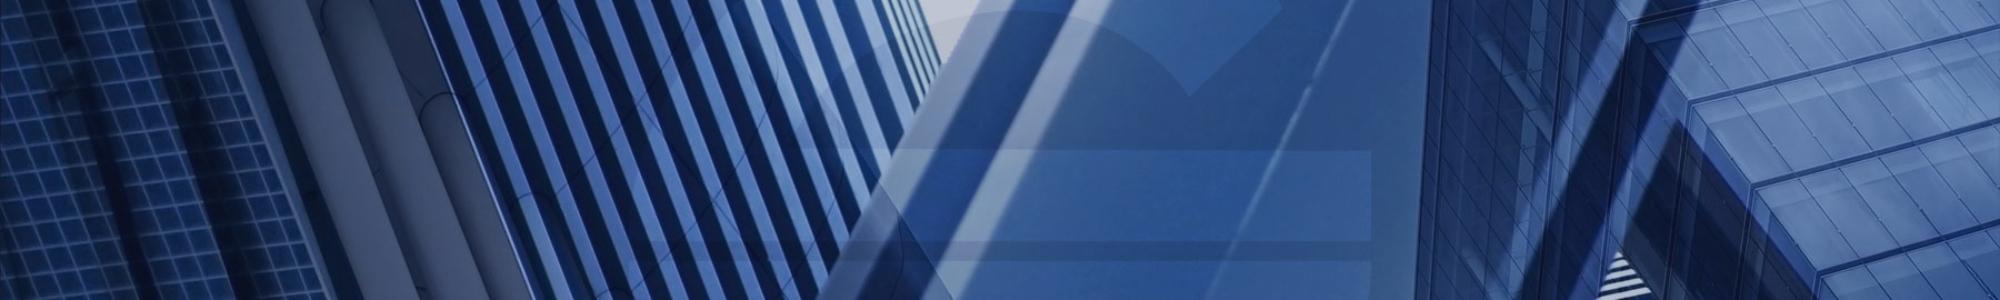 blue-geometric-buildings